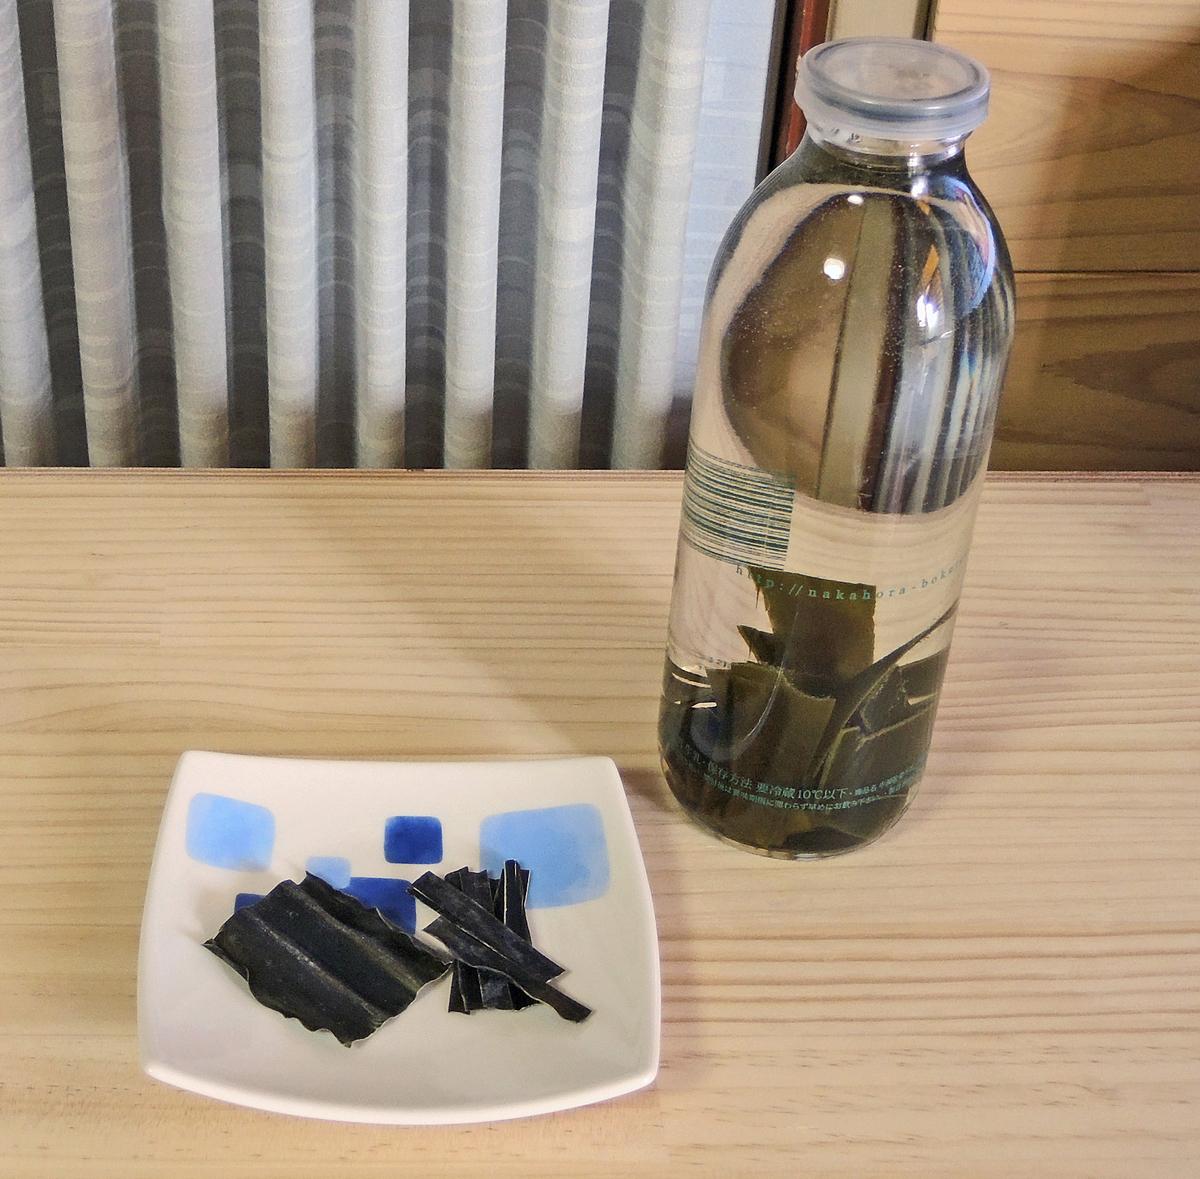 f:id:sashimi-fish1:20210118182948j:image:w180:left